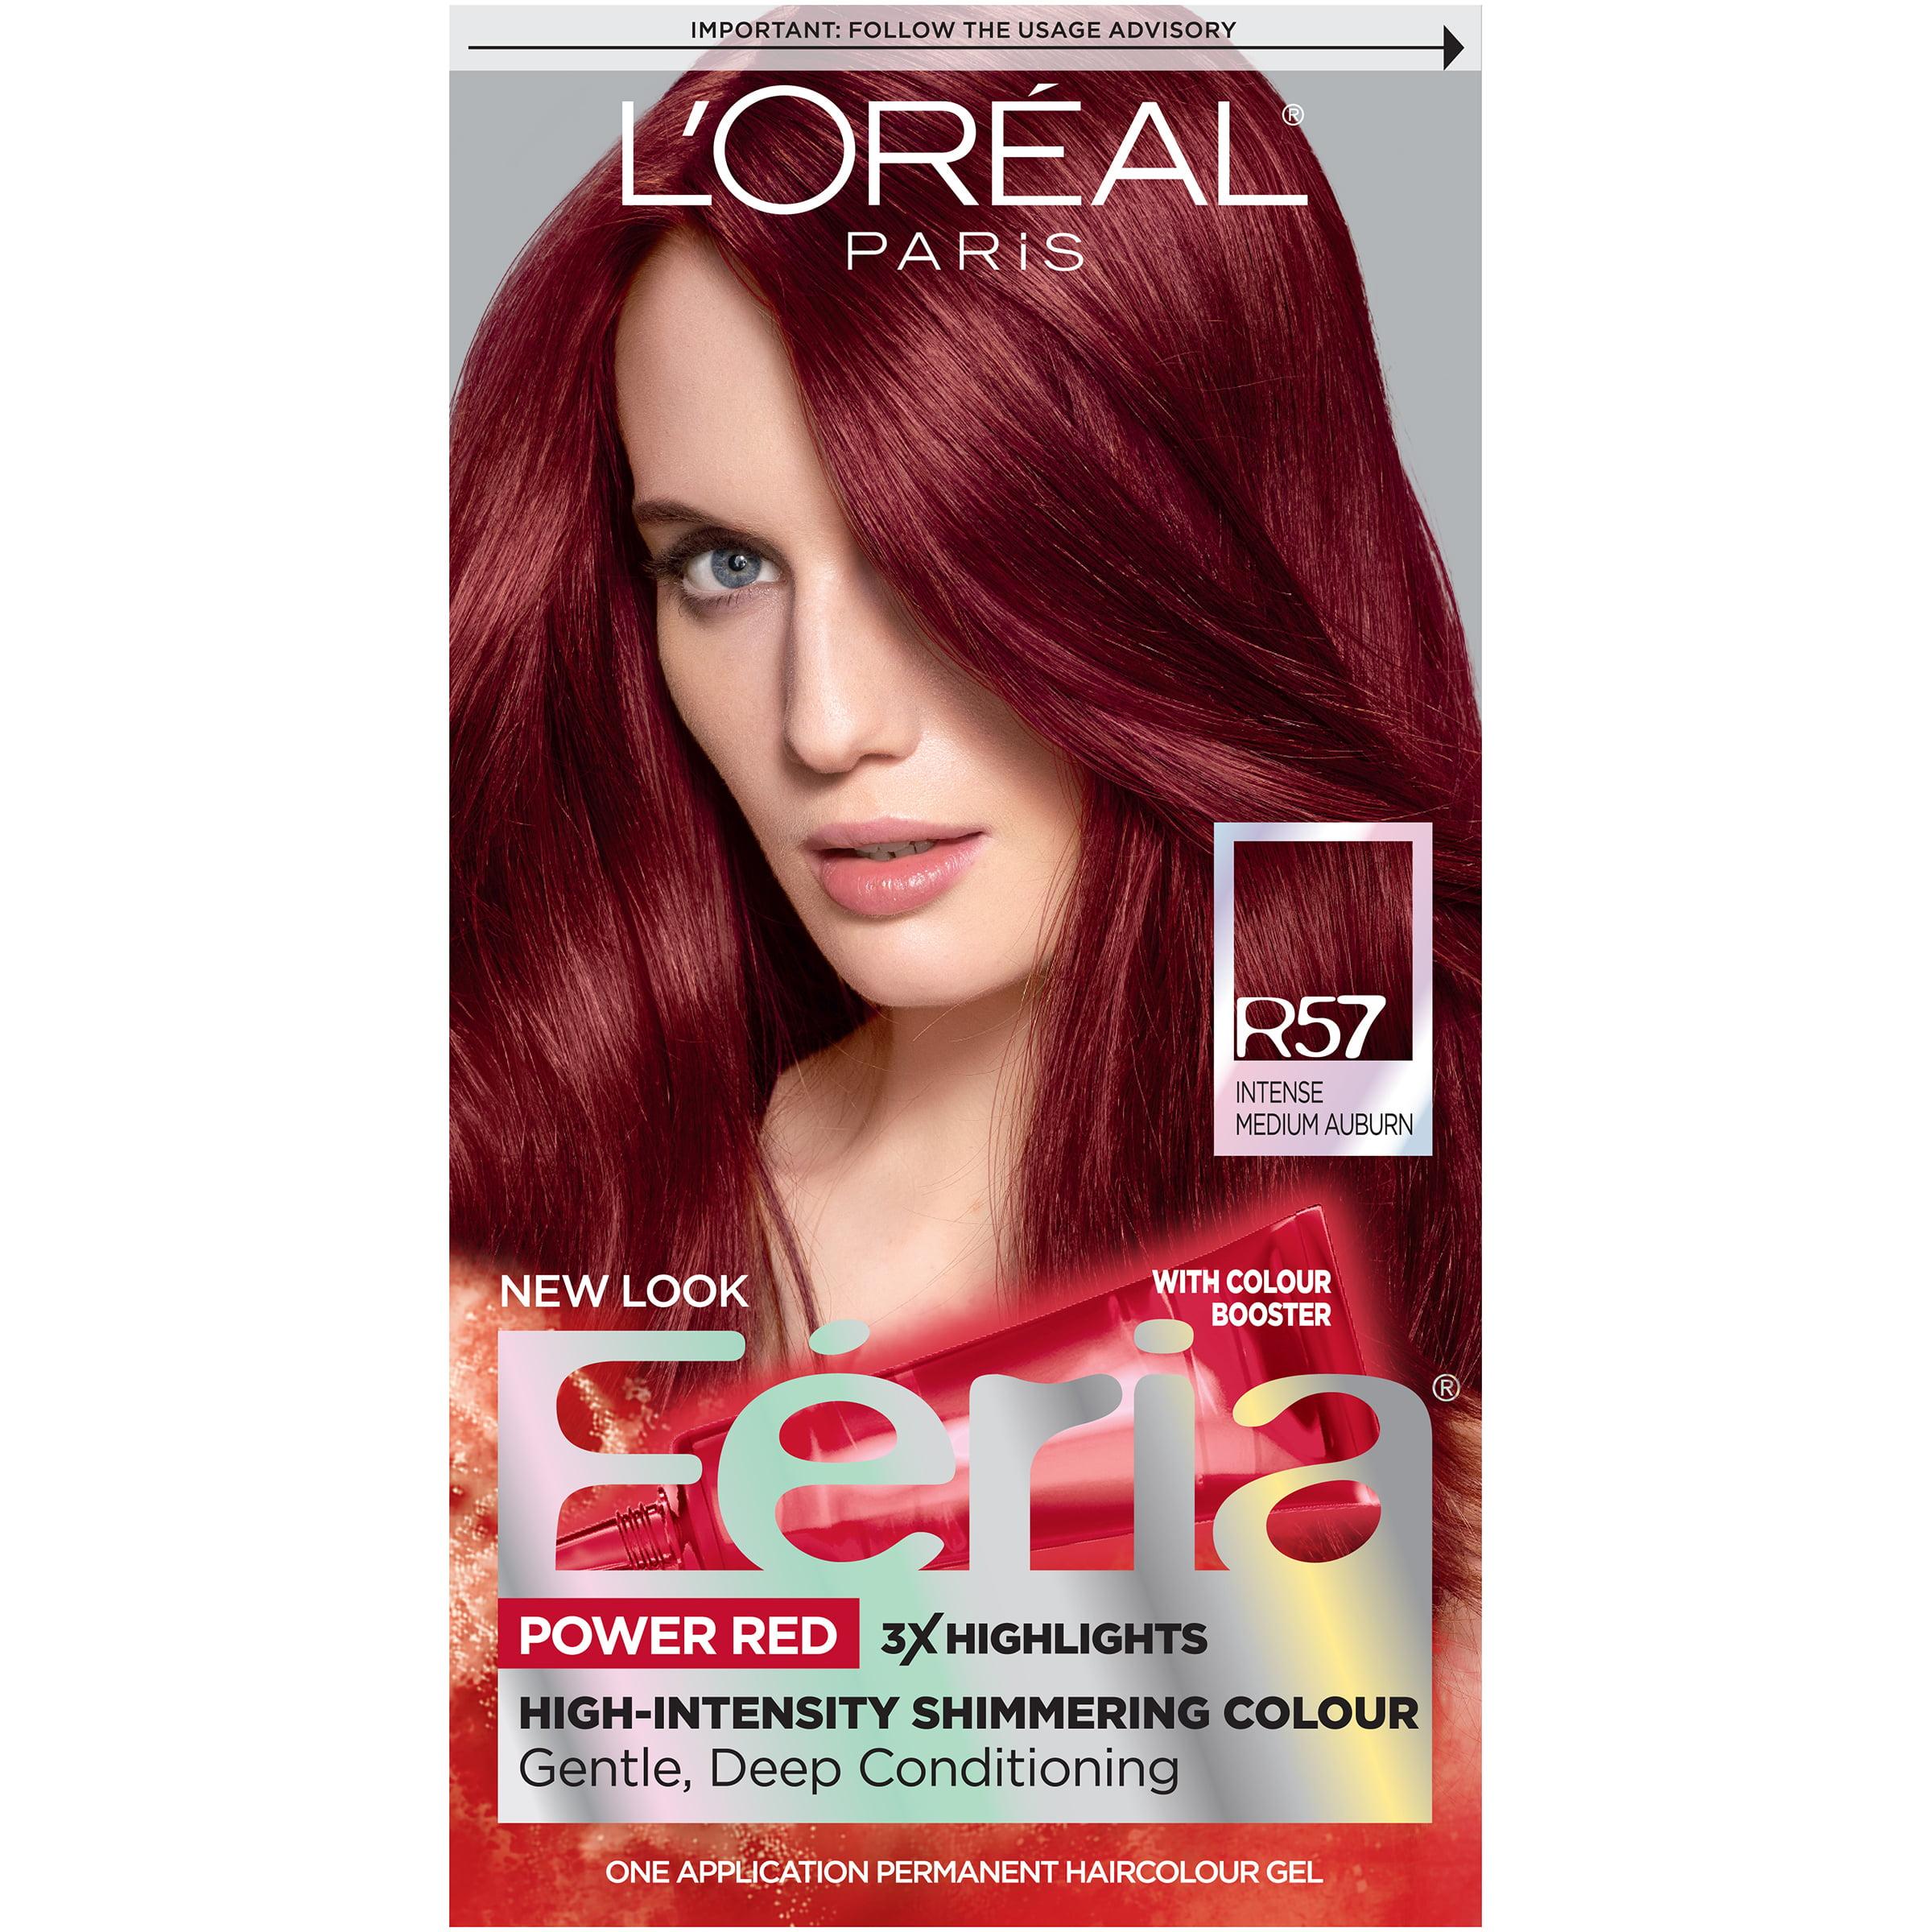 L Oreal Paris Feria Multi Faceted Shimmering Permanent Hair Color R57 Cherry Crush Intense Medium Auburn 1 Kit Walmart Com Walmart Com,Modern White Kitchen Kitchen Floor Tiles Ideas